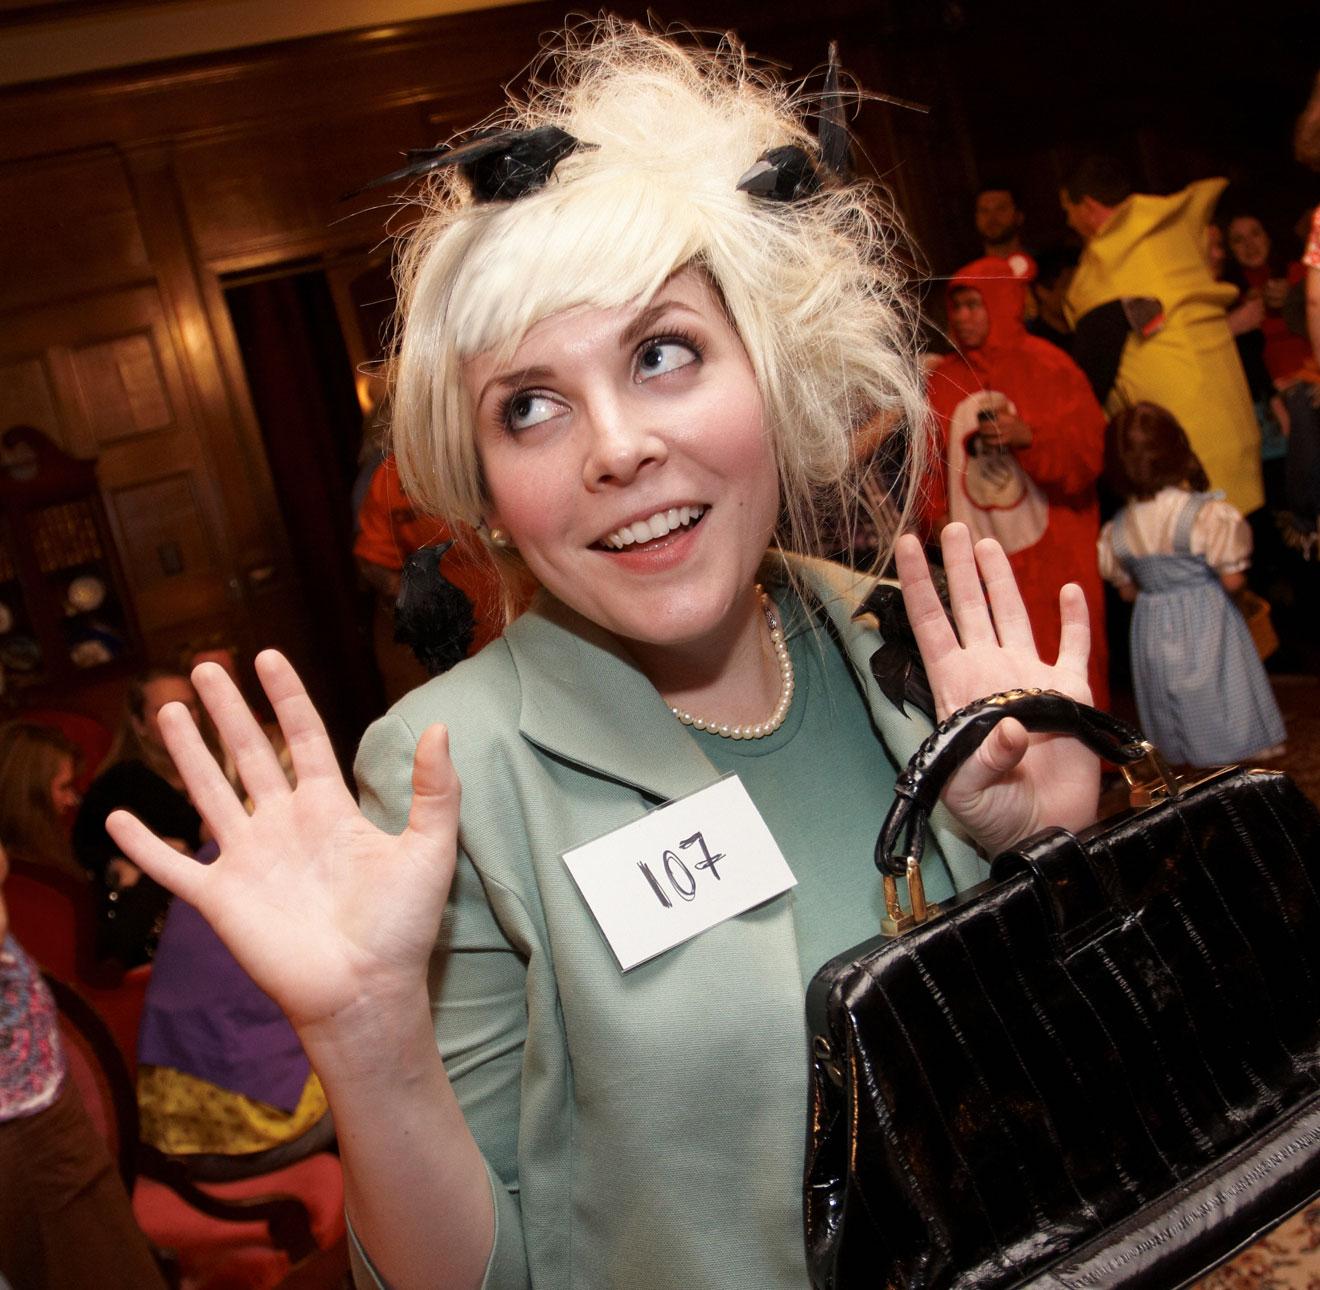 Emily-Halloween-scared